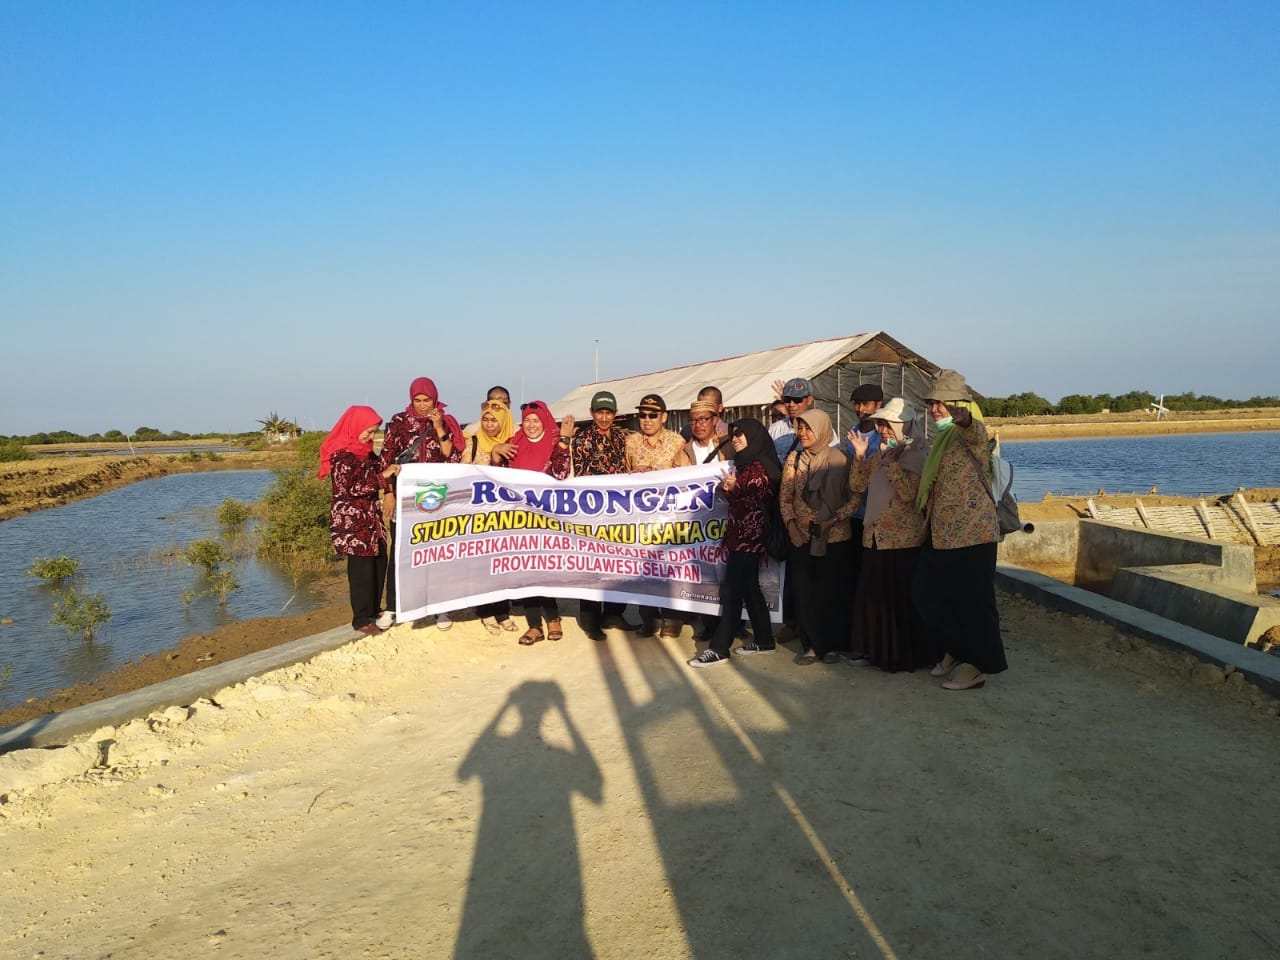 Study Banding Pelaku Usaha Garam Dinas Perikanan Kab. Pangkajene Provinsi Sulawesi Selatan